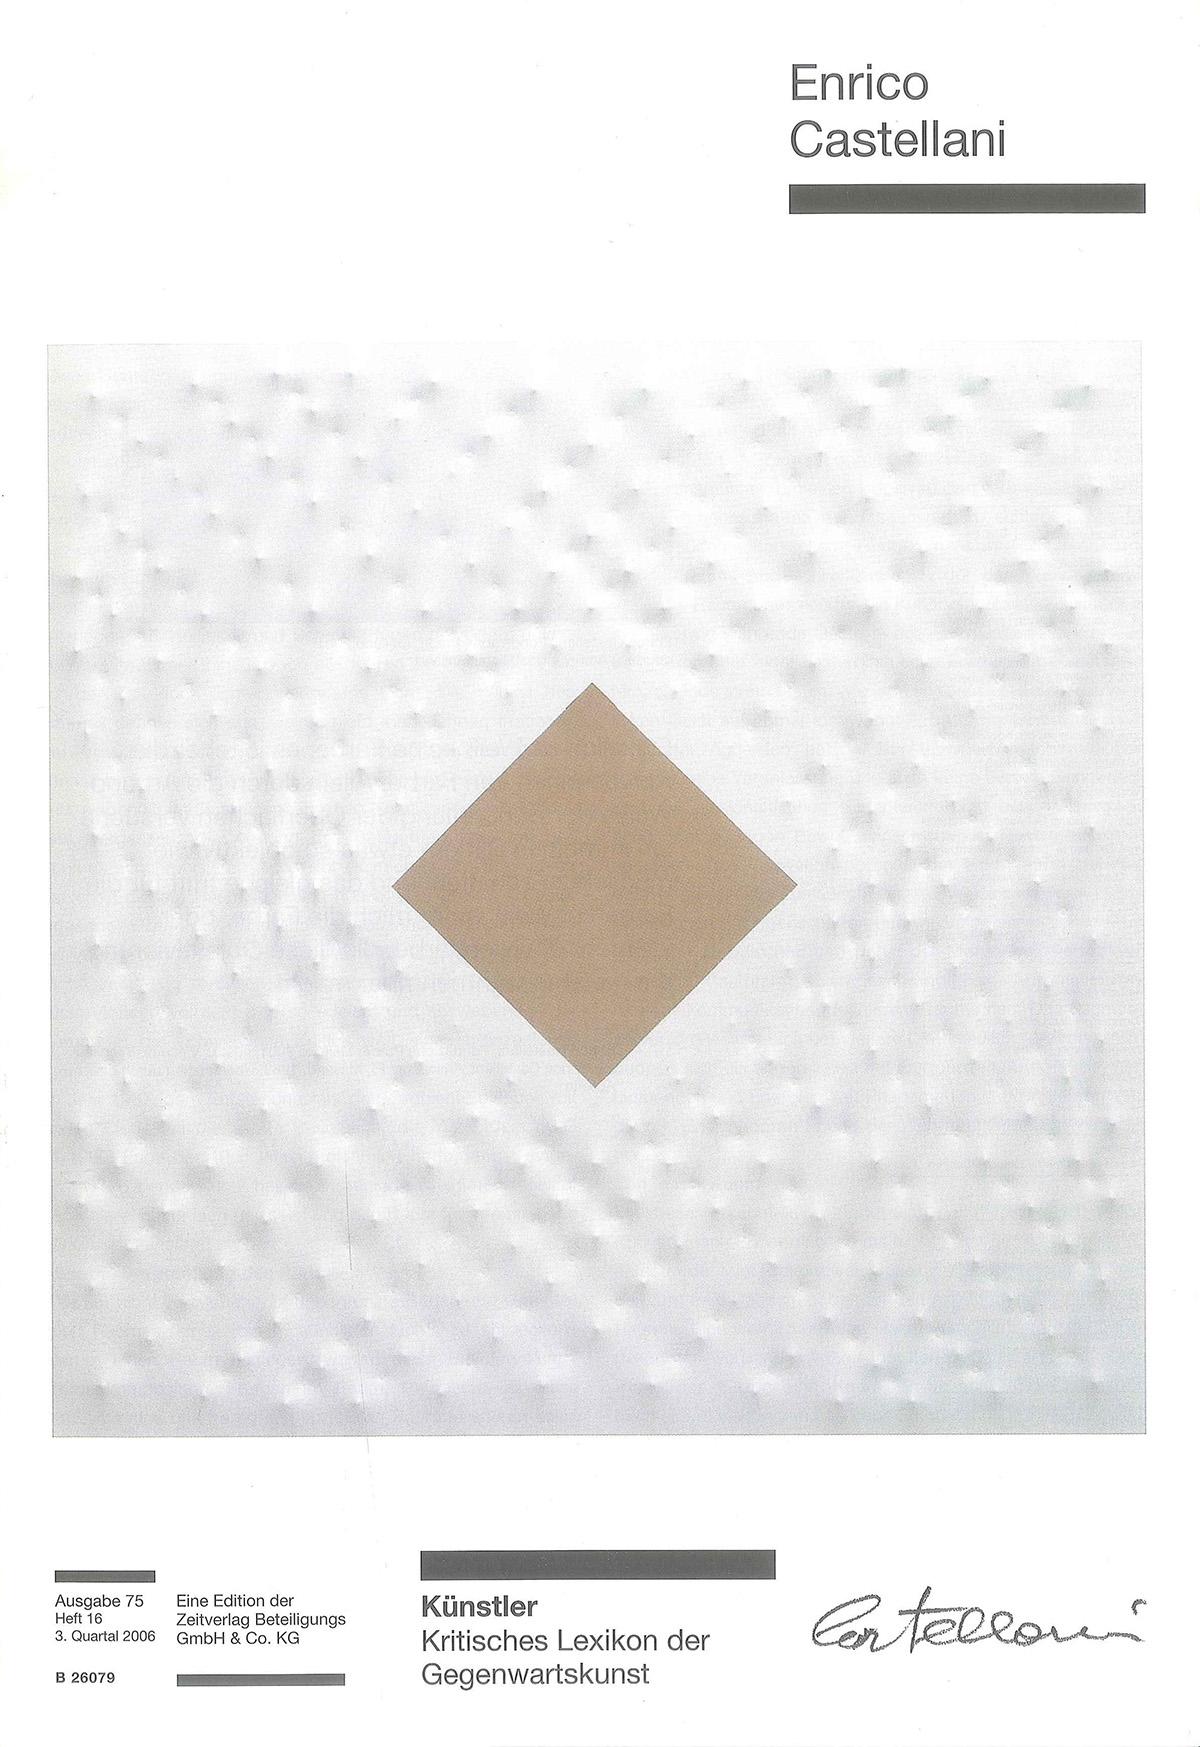 Cover - Enrico Castellani, Iris Simone Engelke, 2006, Zeitverlag Beteiligungs GmbH & Co., Monaco (DEU)